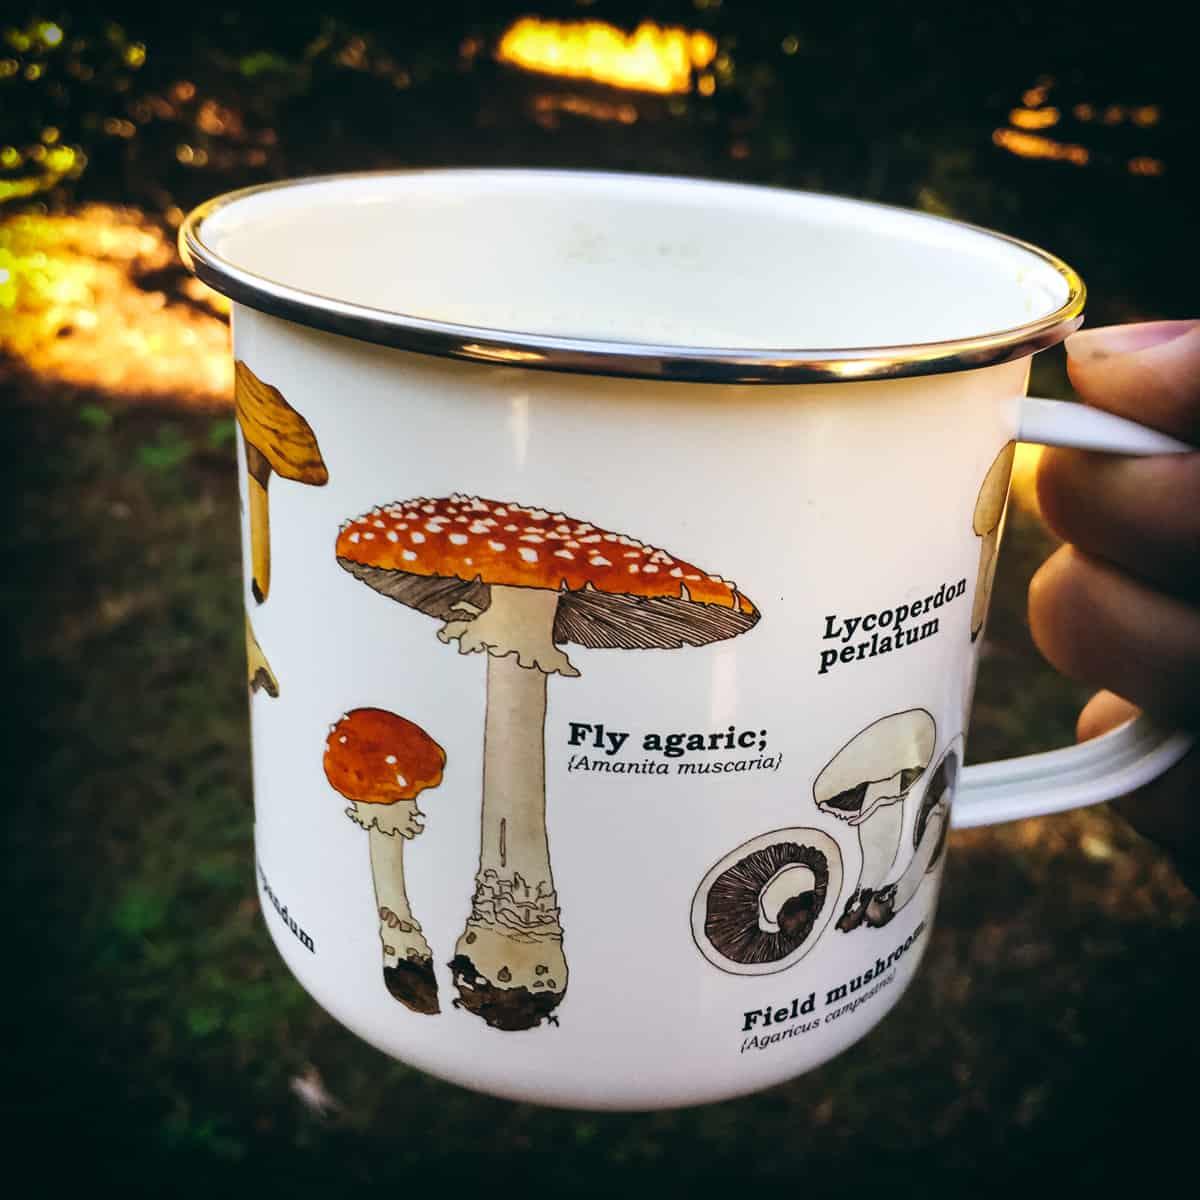 a hand holding a mushroom mug